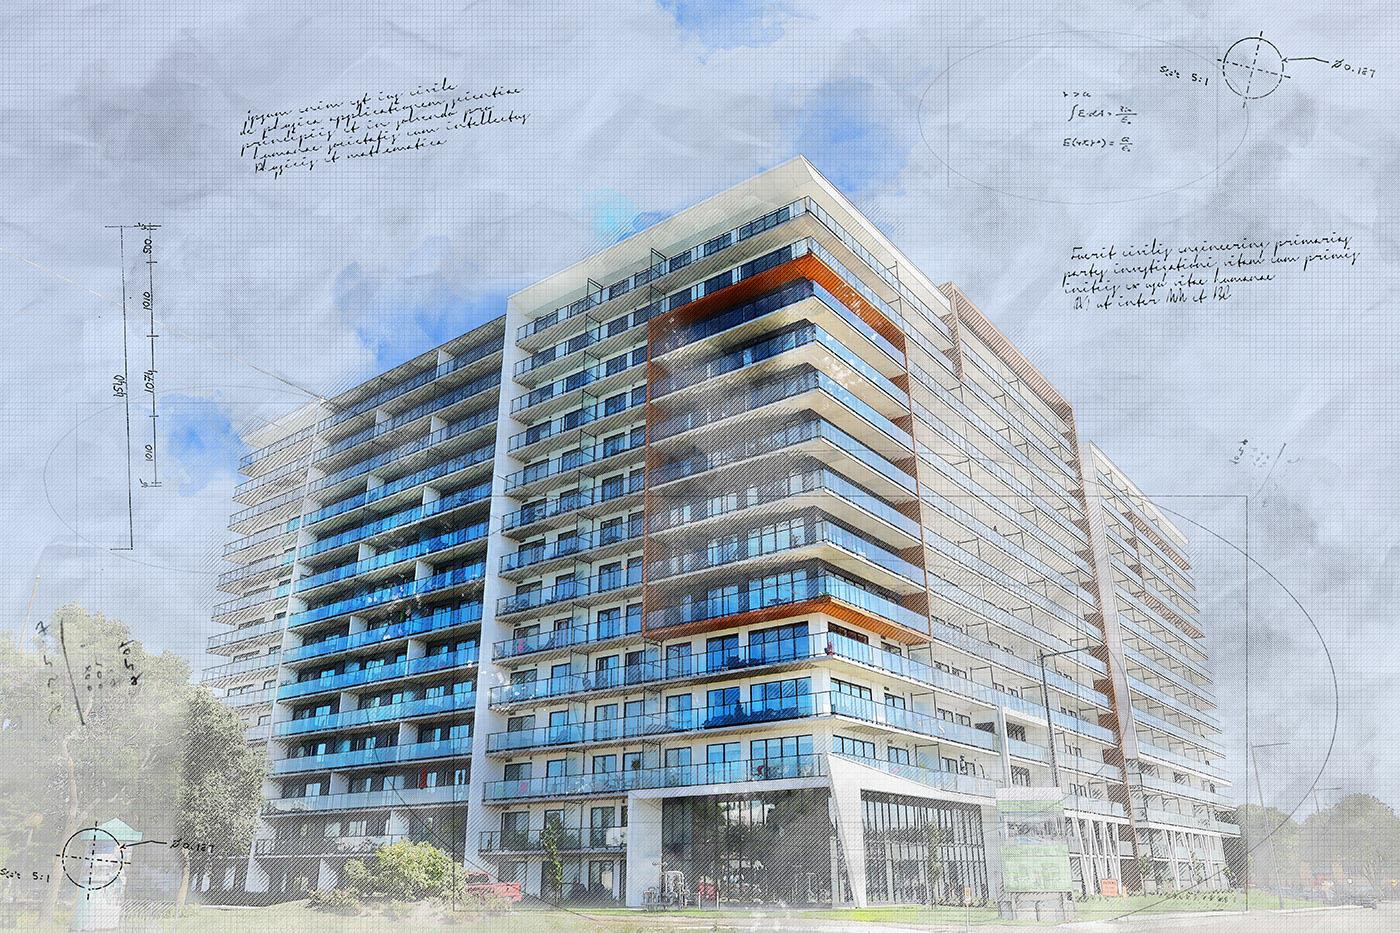 Large Condominium Building Sketch Image - Stock Photos, Pictures & Images